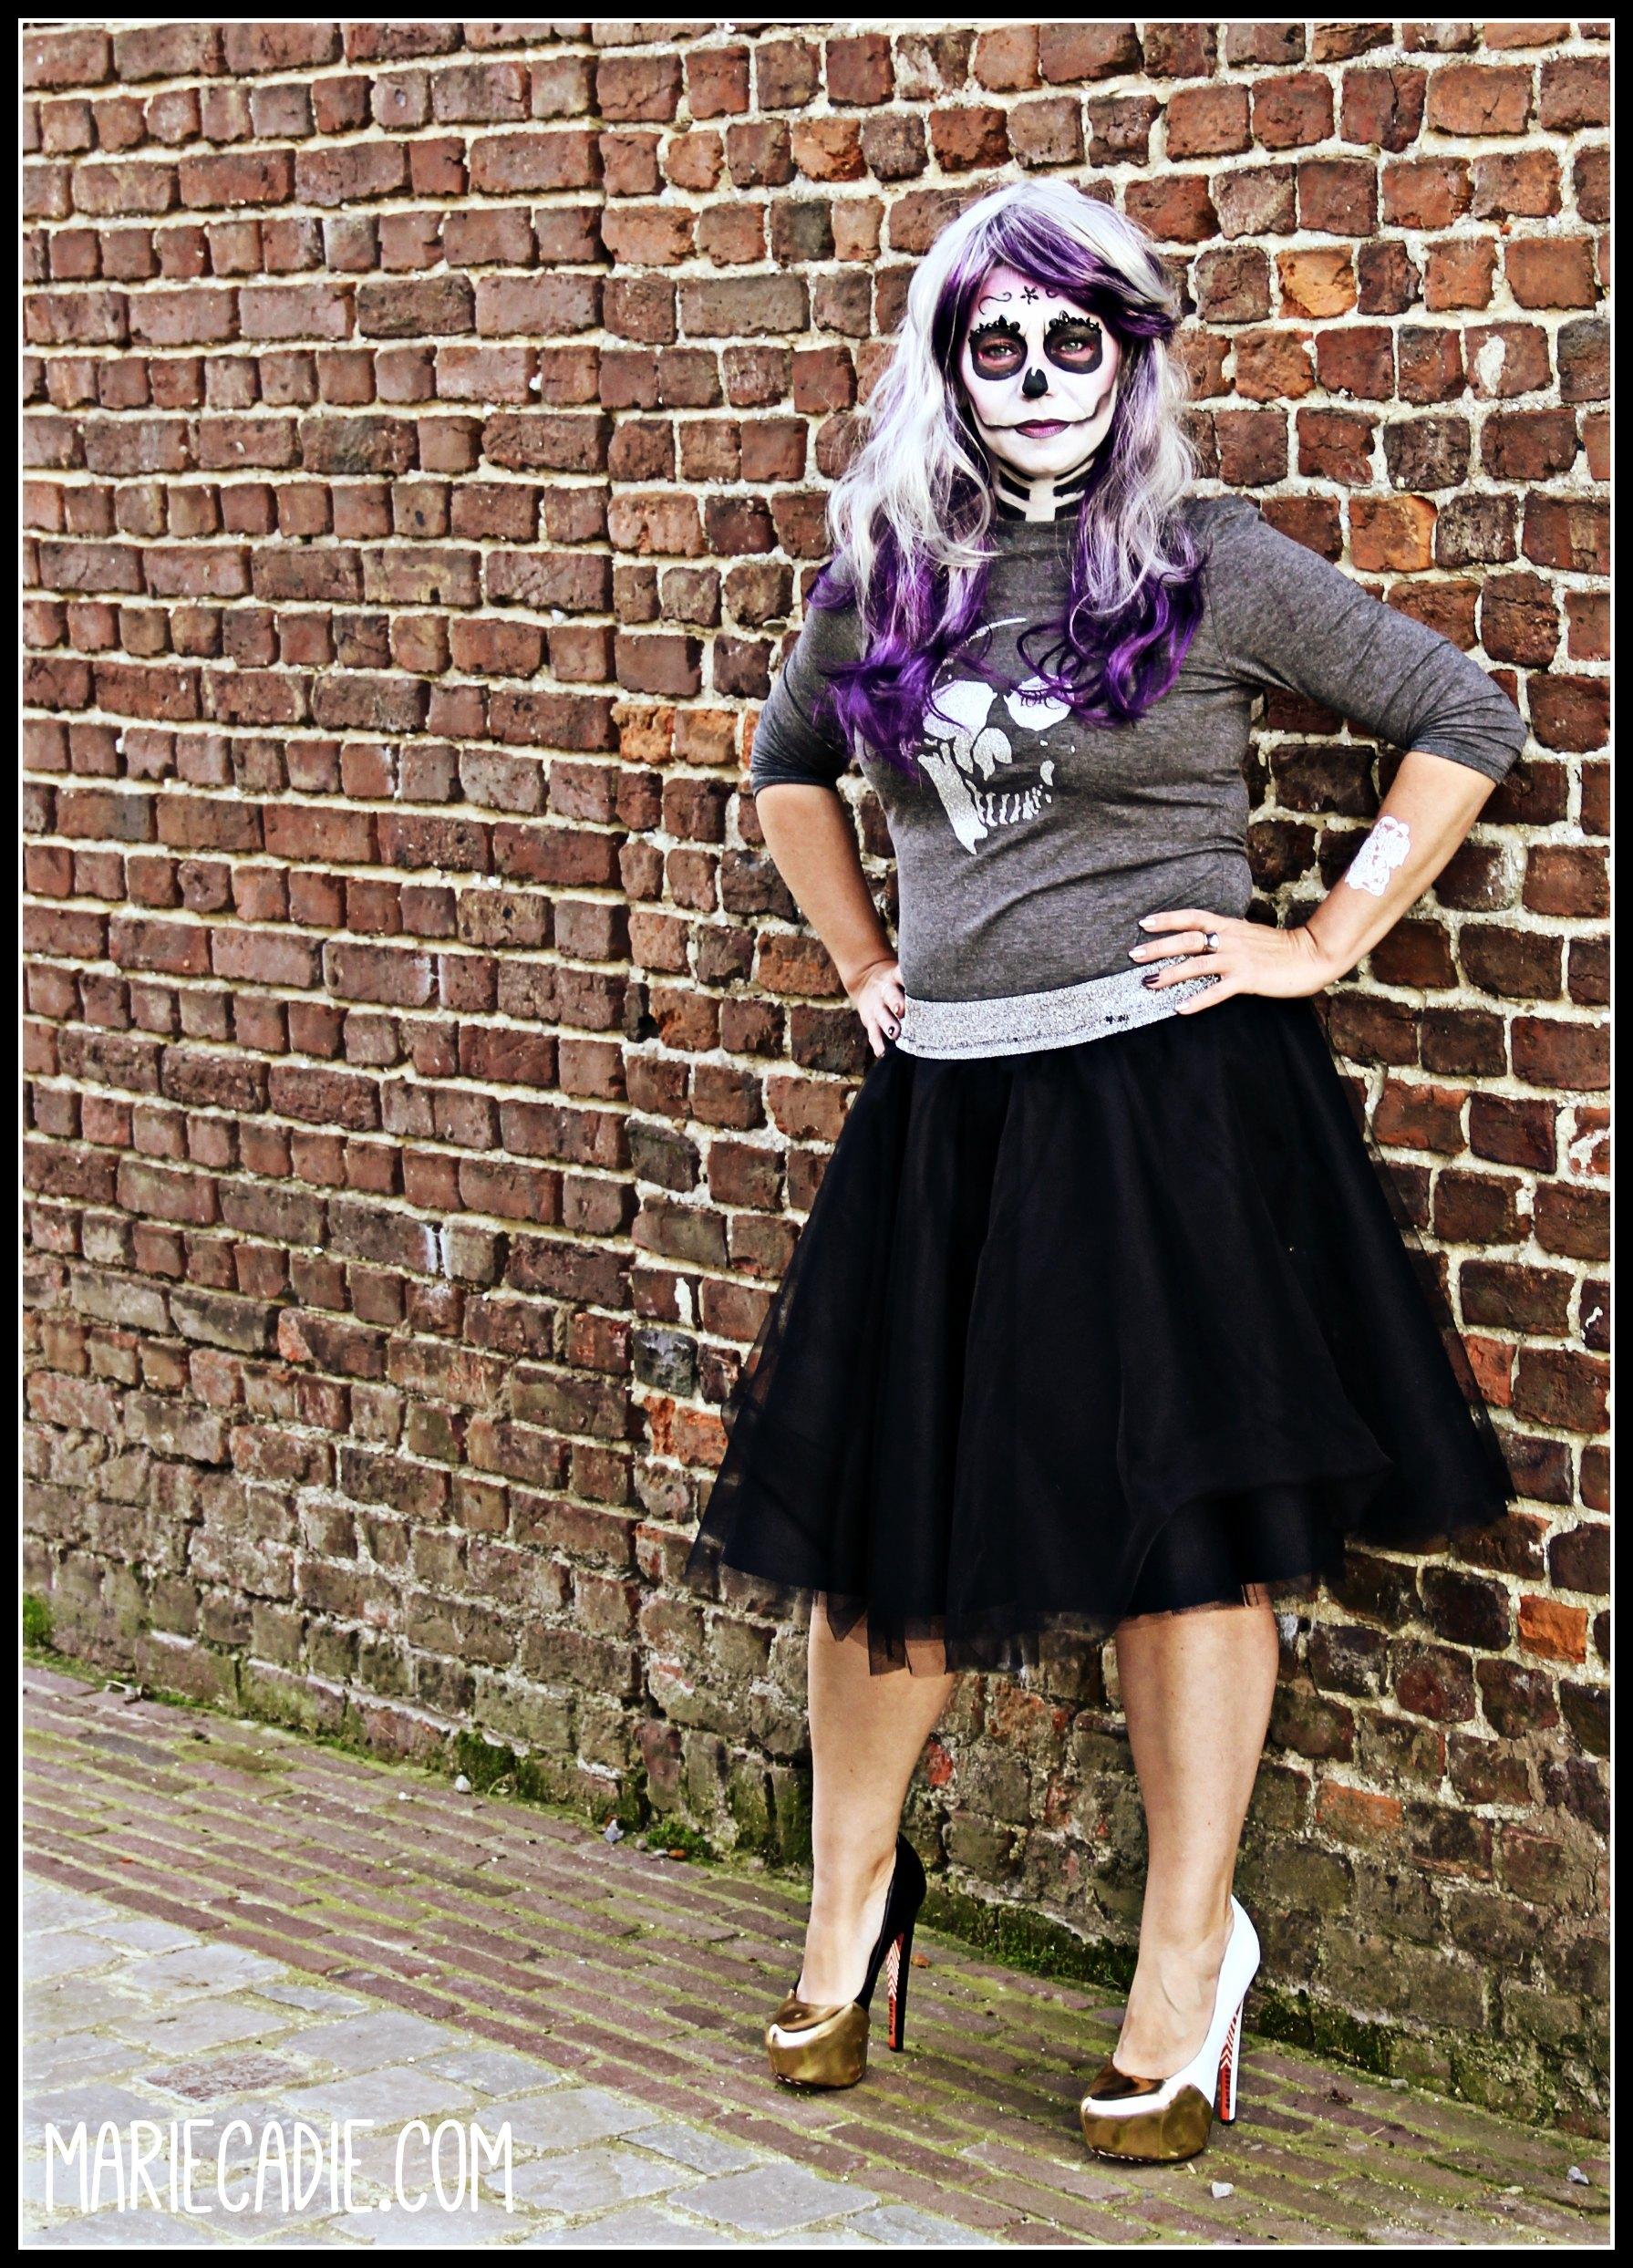 mariecadie-com-sugar-skull-halloween_1